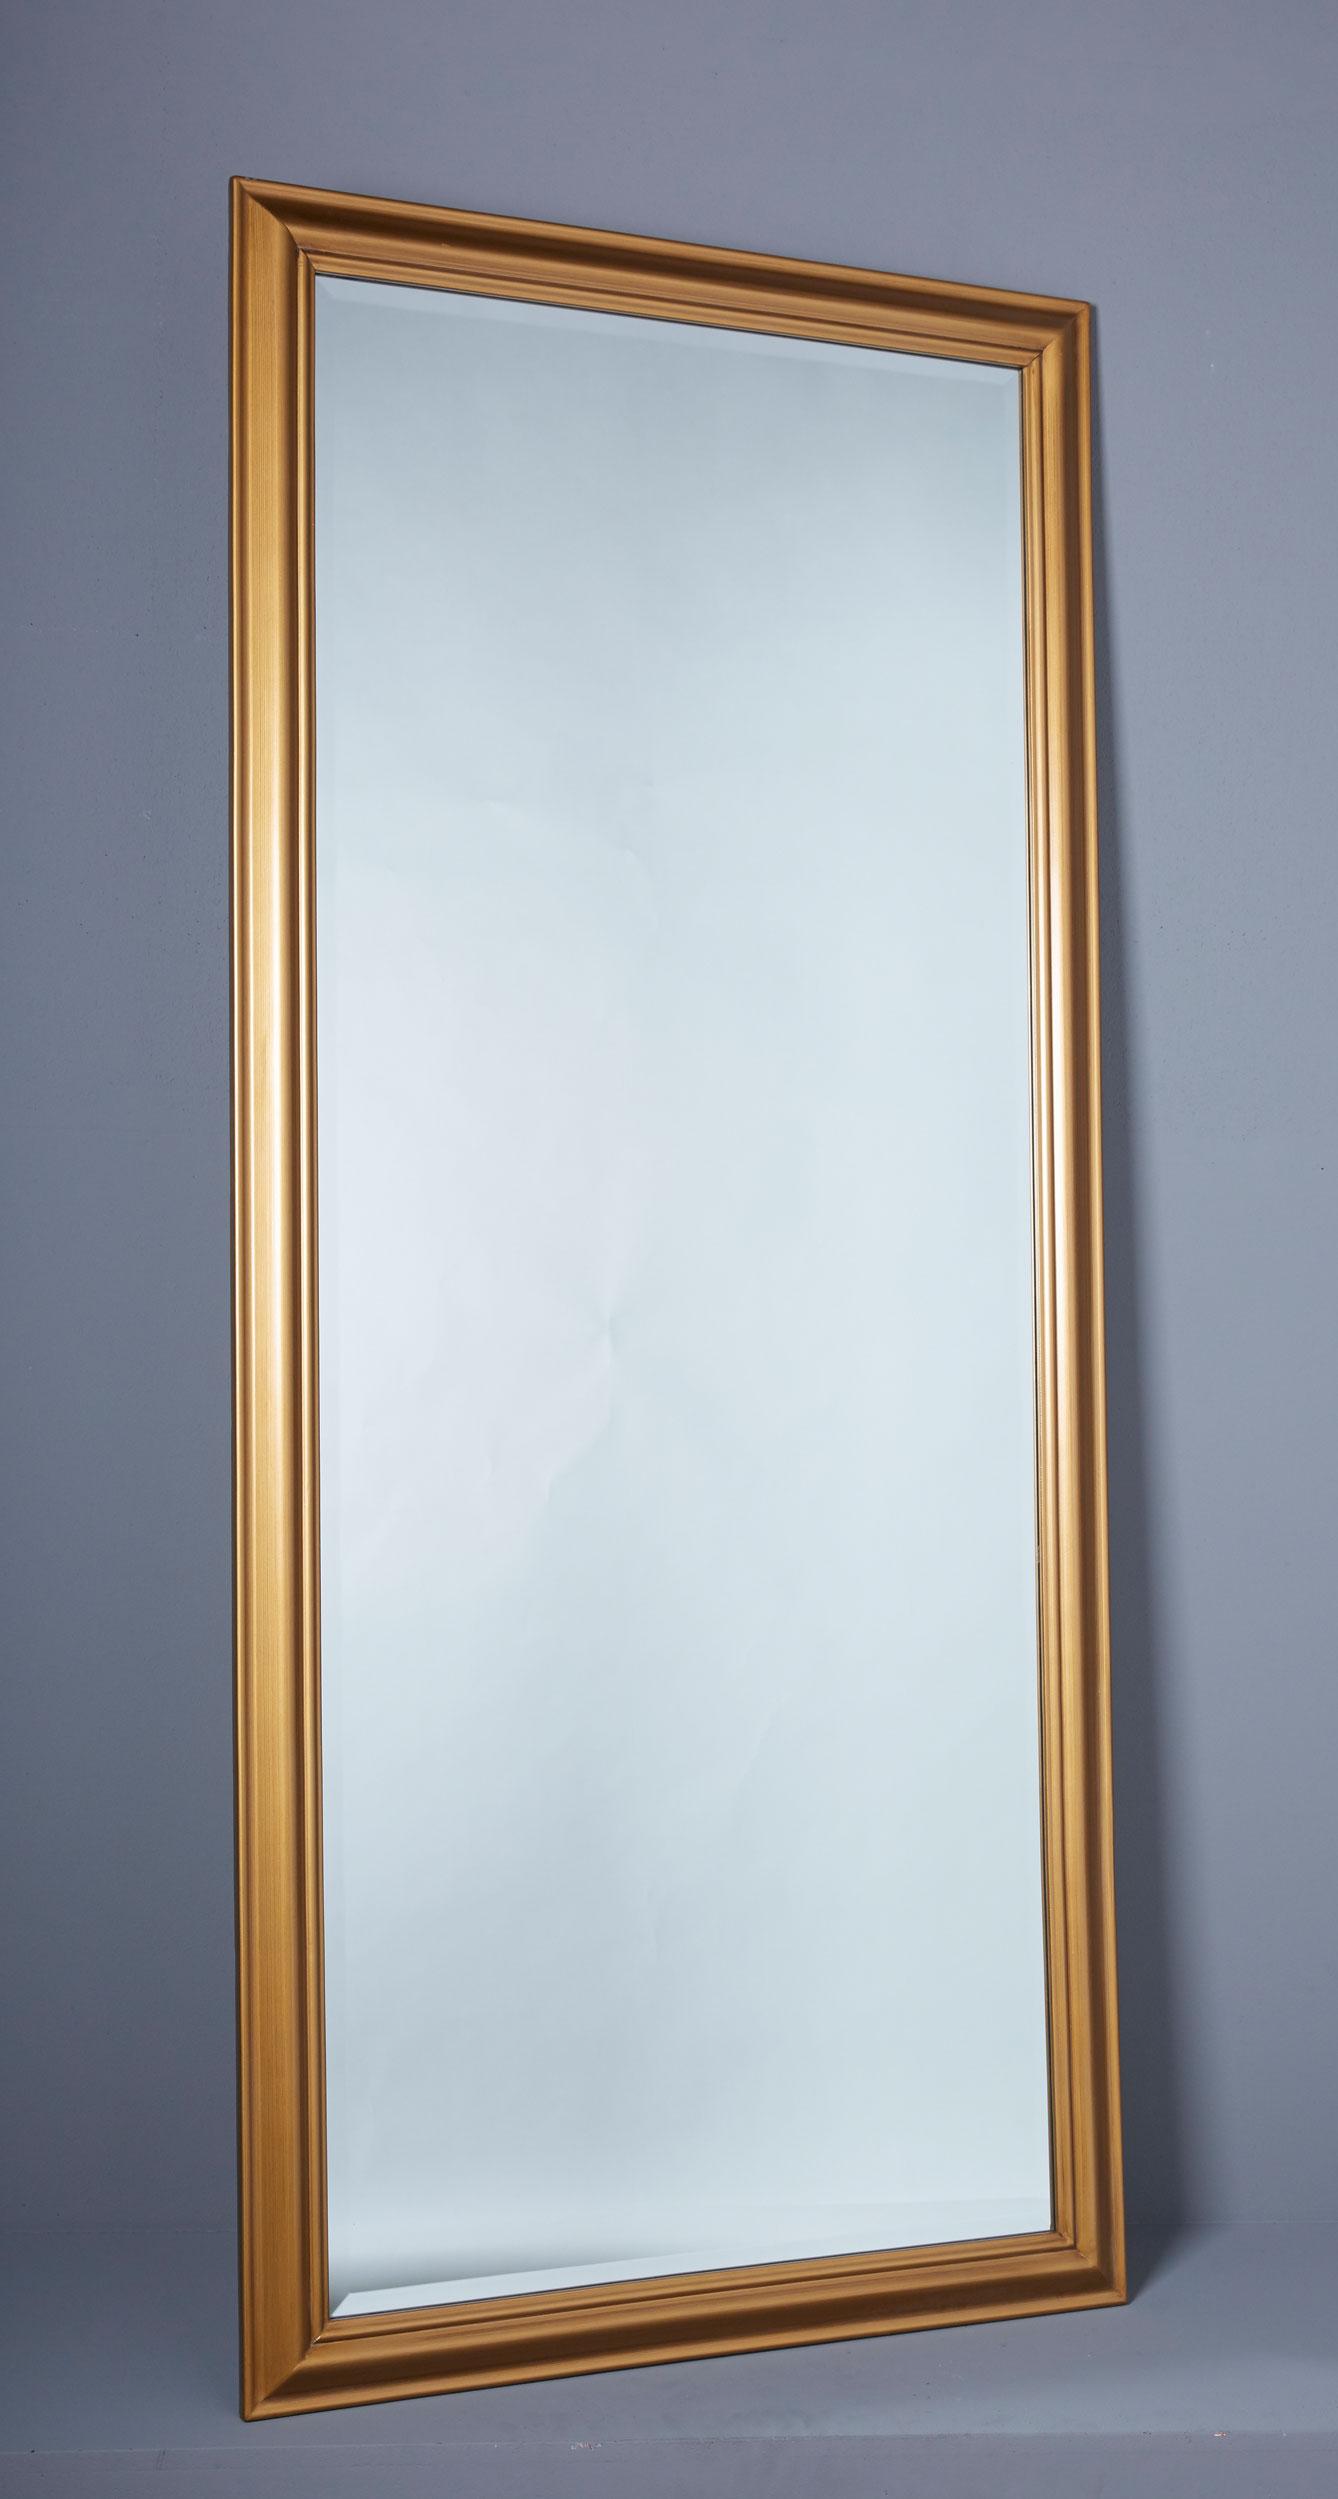 spiegel wandspiegel 180 x 80 cm gold eleganter landhaus stil shabby chic 7426814417965 ebay. Black Bedroom Furniture Sets. Home Design Ideas